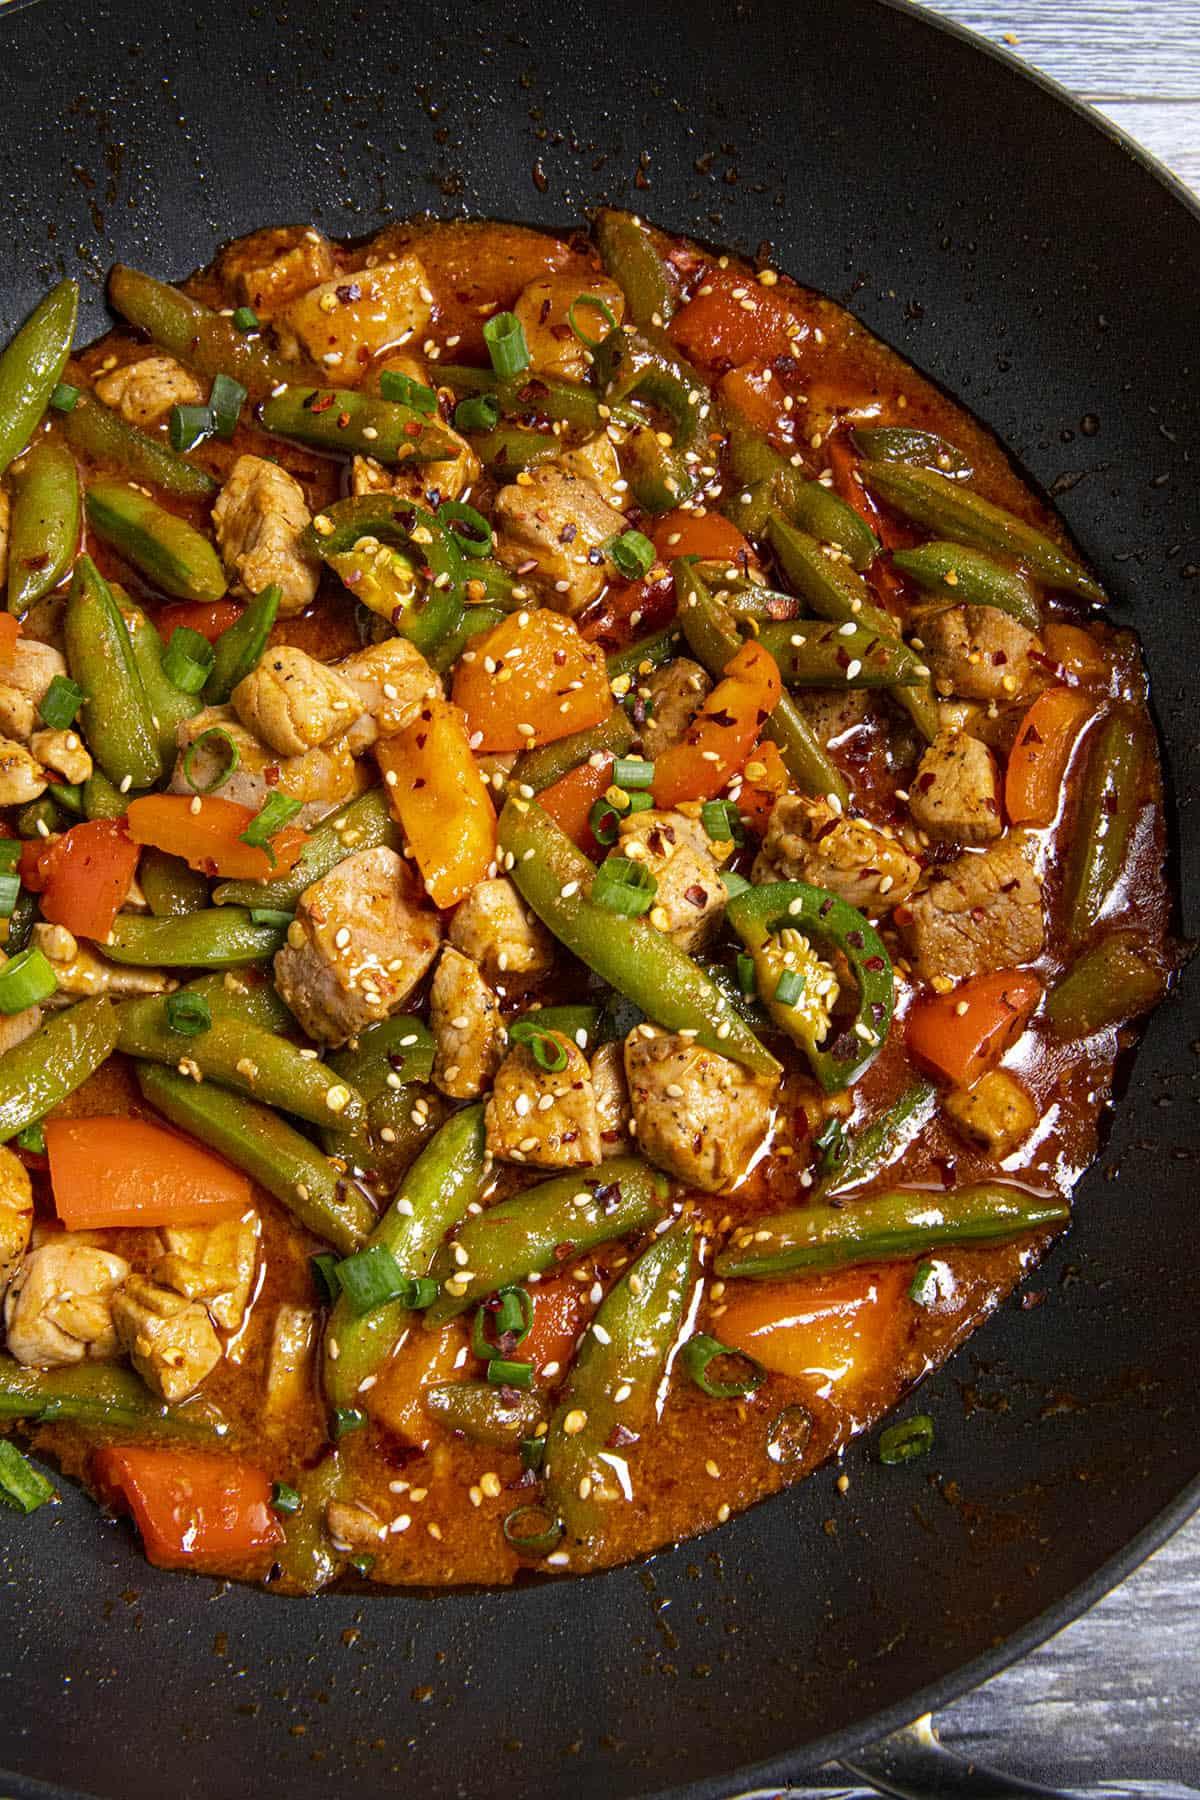 Spicy Pork Stir Fry in a pan